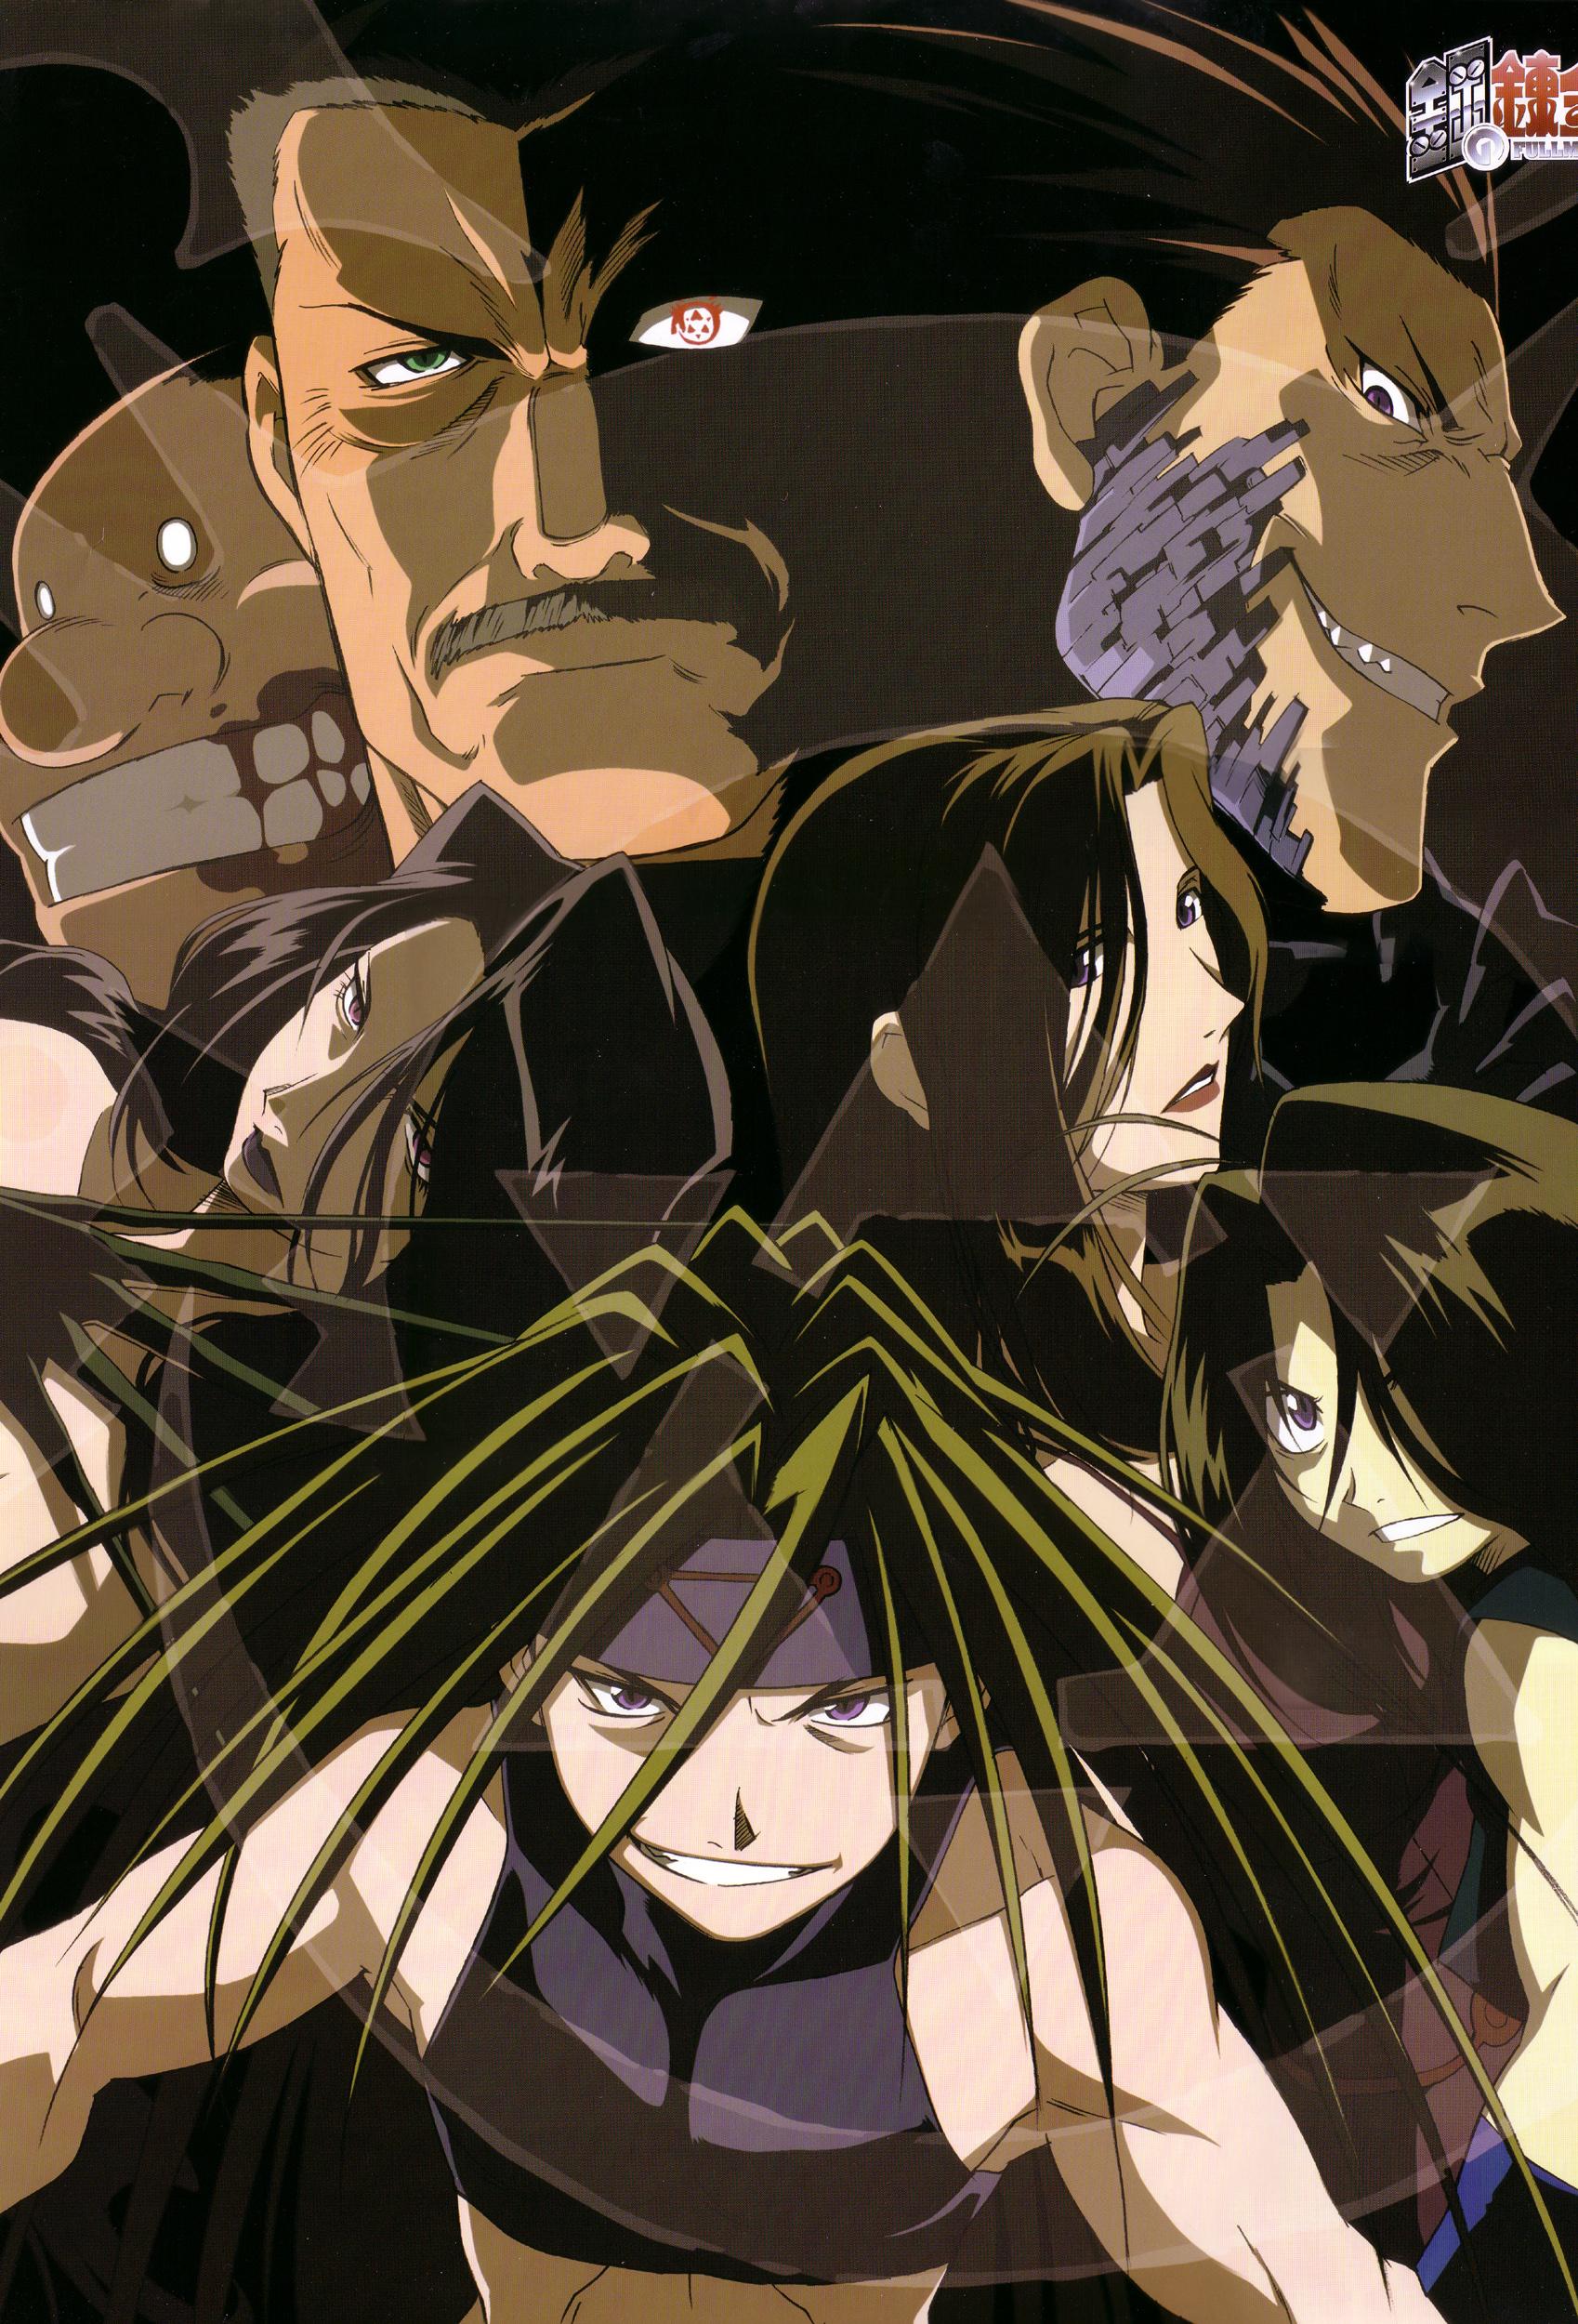 Fullmetal Alchemist: 7 Deadly Sins - Minitokyo